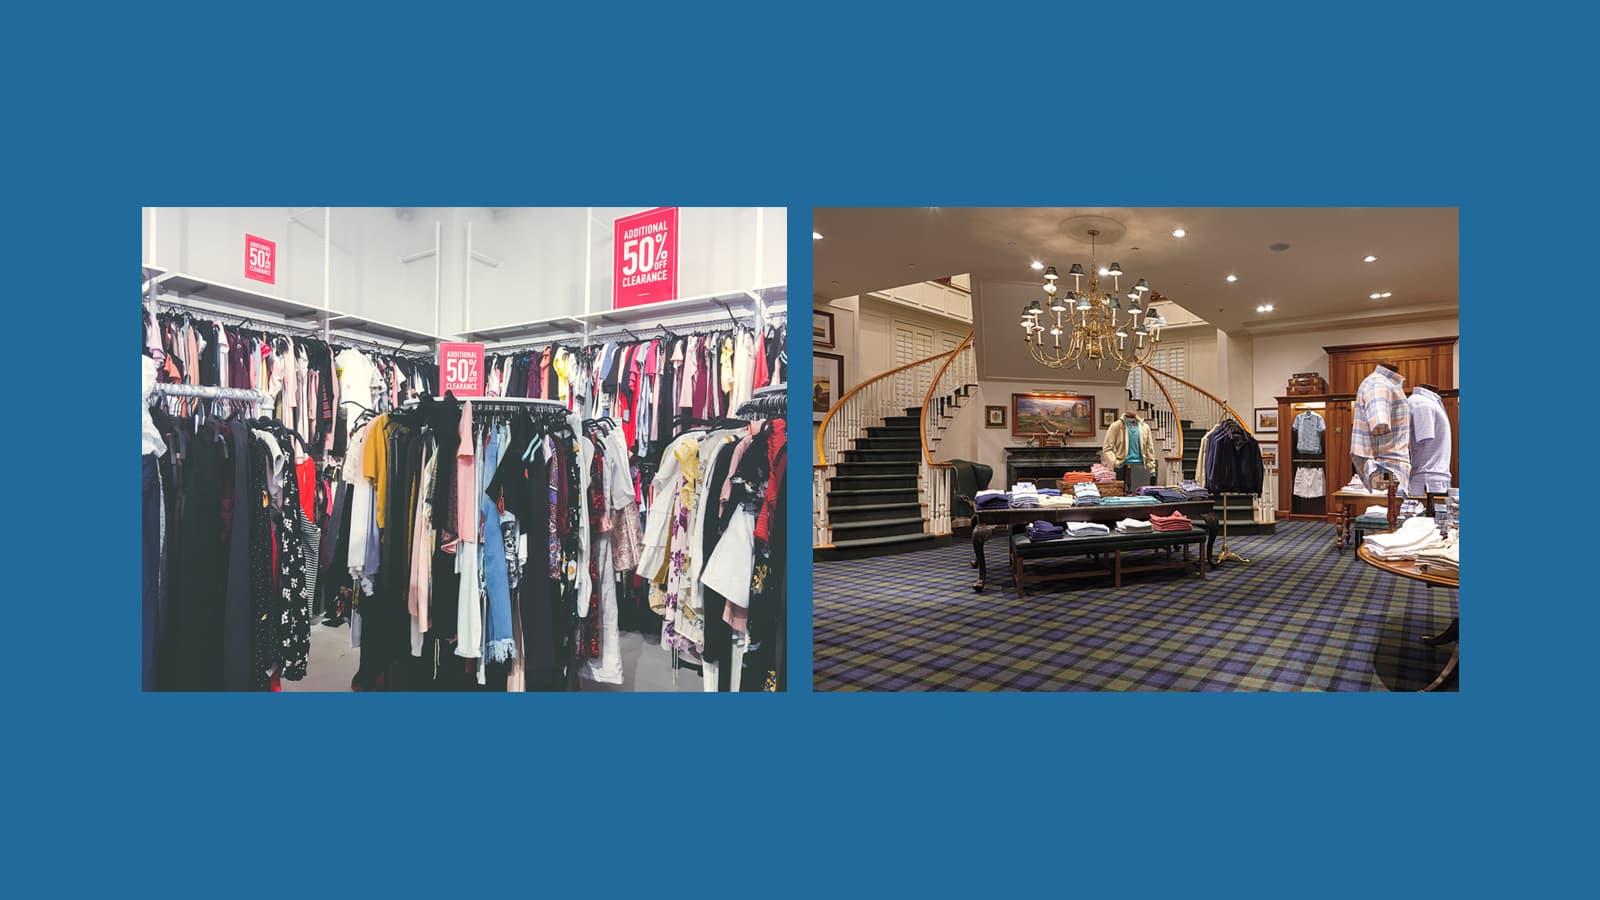 Low-price vs. upscale retail space comparison